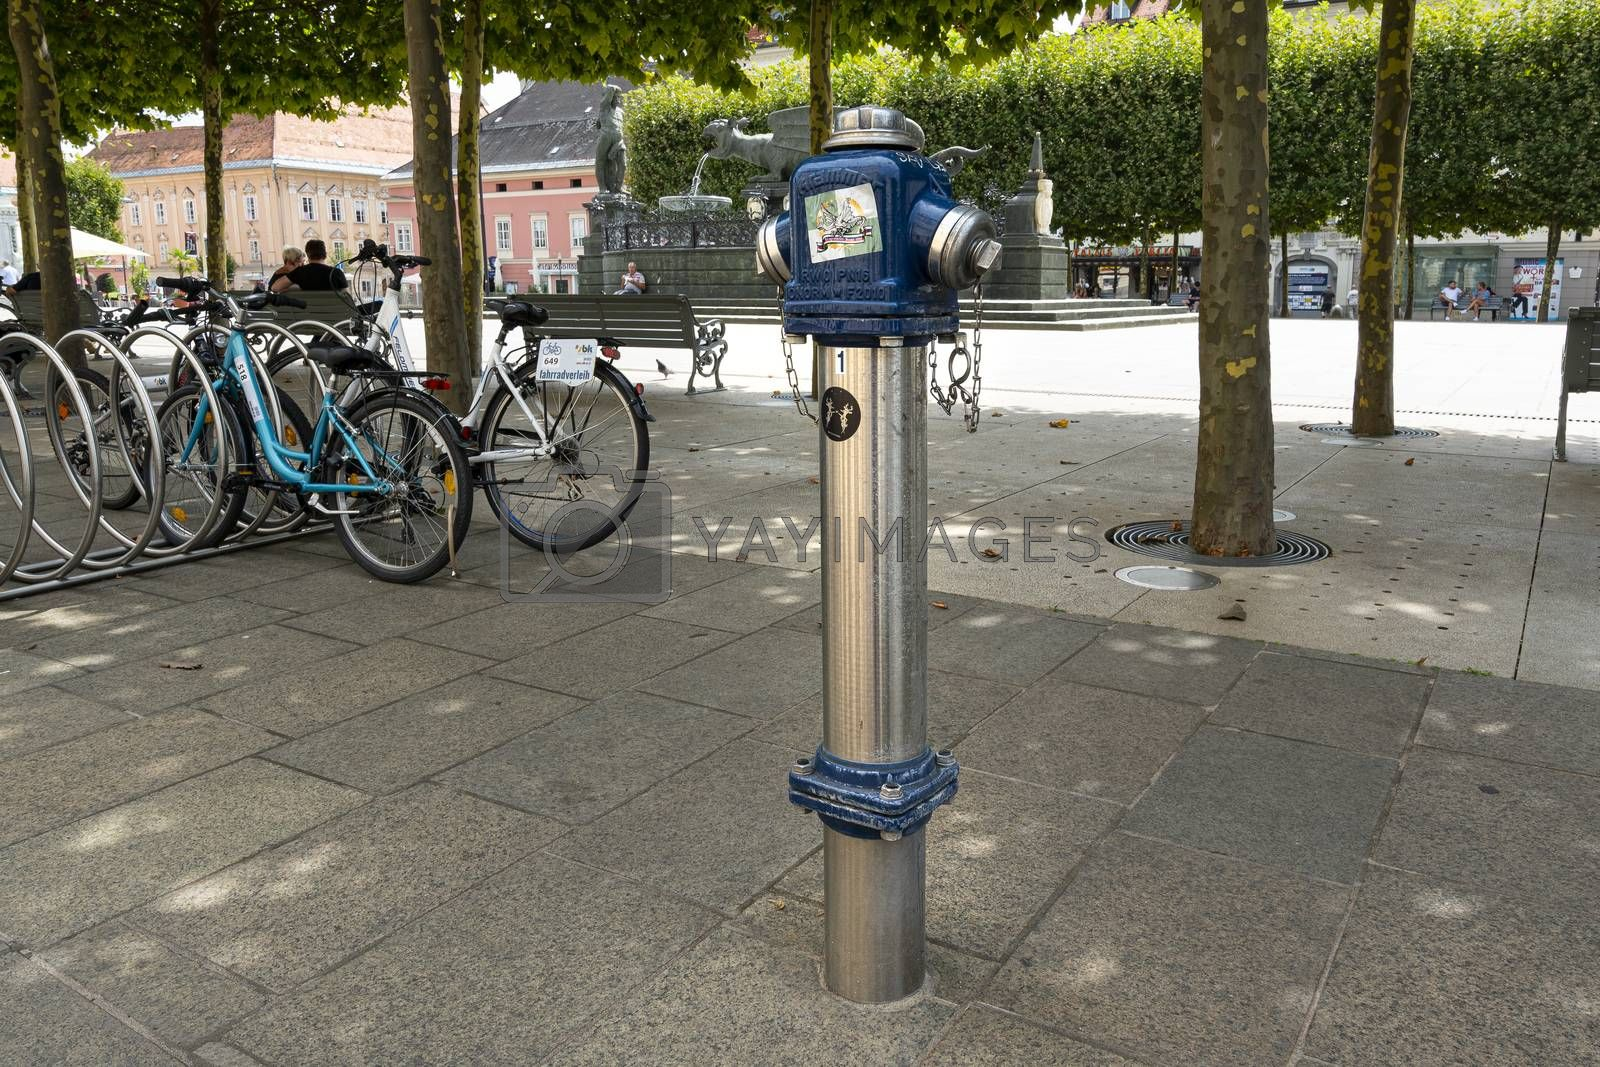 Klagenfurt, Austria. August 16, 2020. in fire hydrant in the sidewalk of the city center